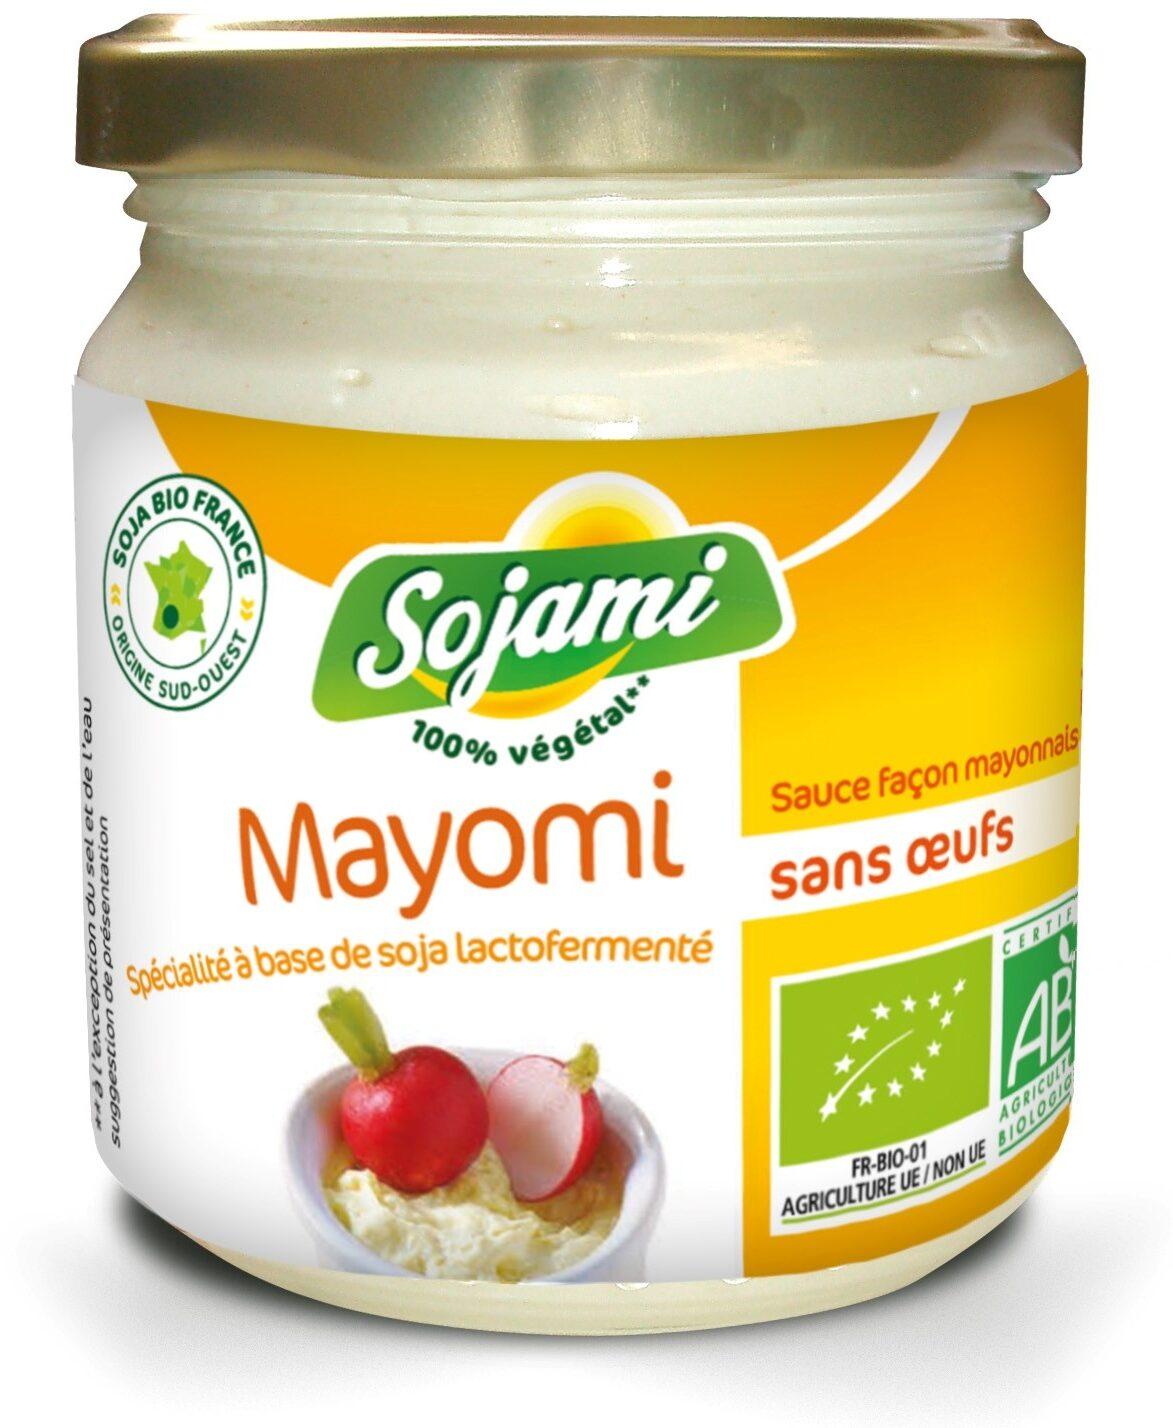 Mayomi - Sauce façon mayonnaise - Product